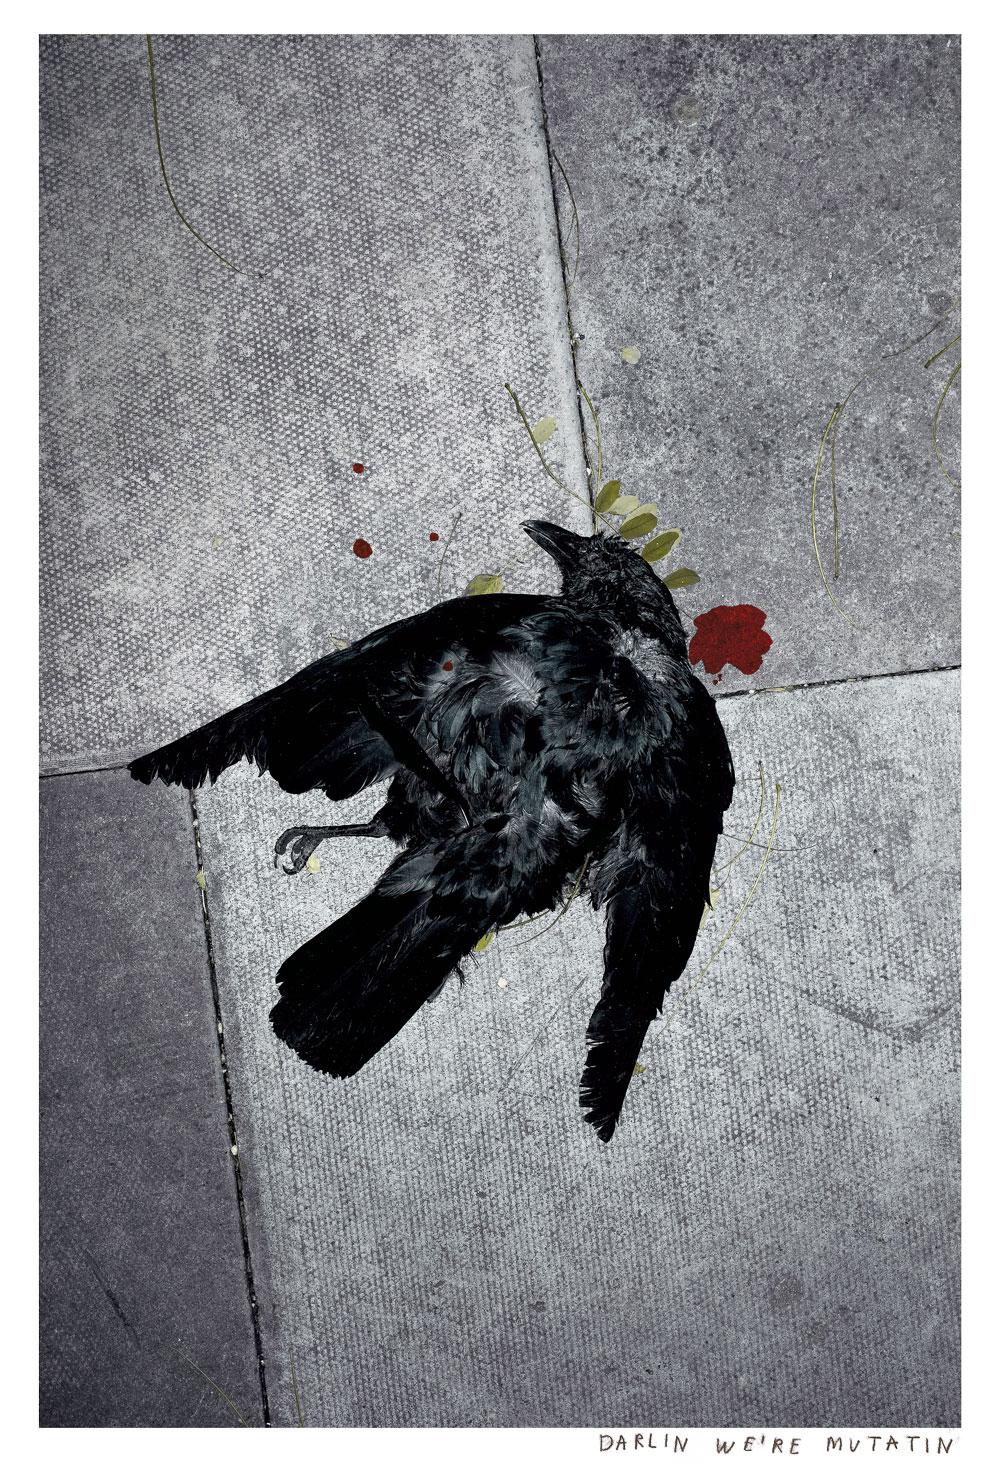 Melissa Spiccia | SEE FLOWERS IN HELL DARLIN WE'RE MUTATIN MELISSA SPICCIA